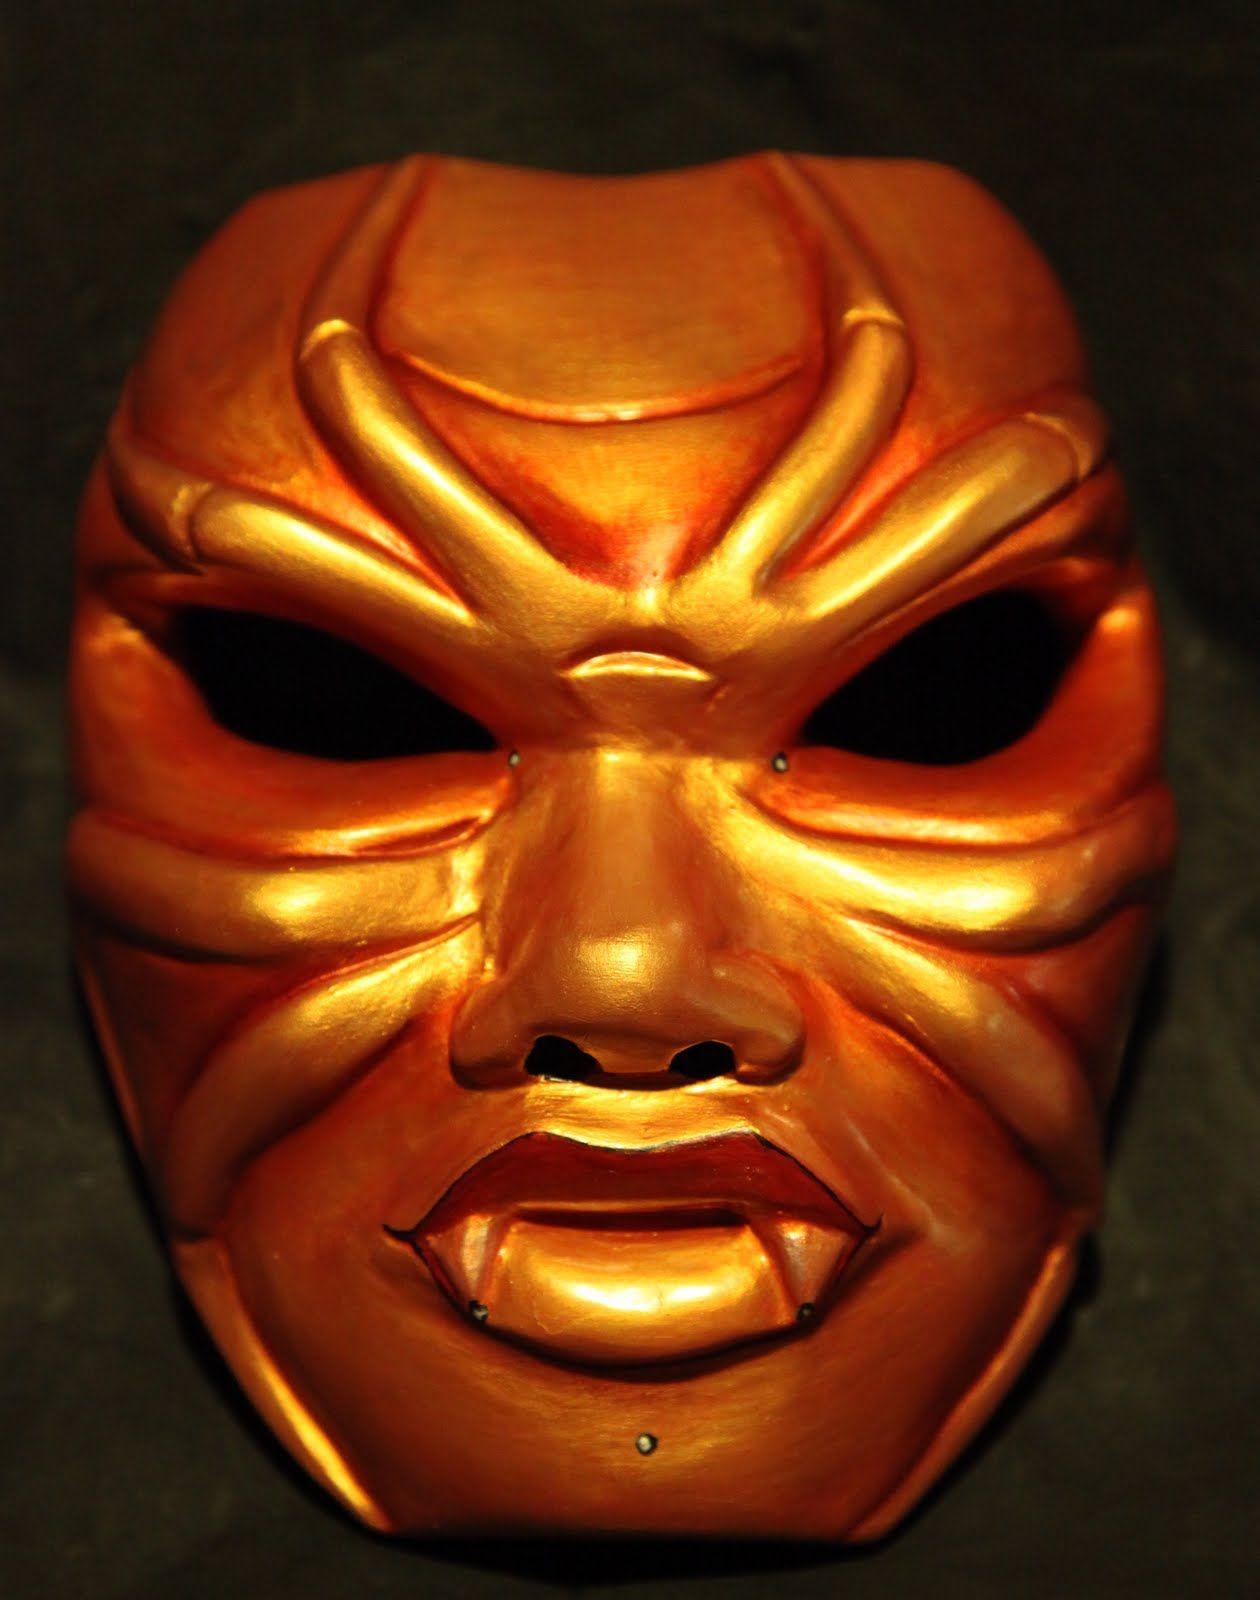 Mask Spider Queen Contemporary Spider Medicine Symbolism Of The